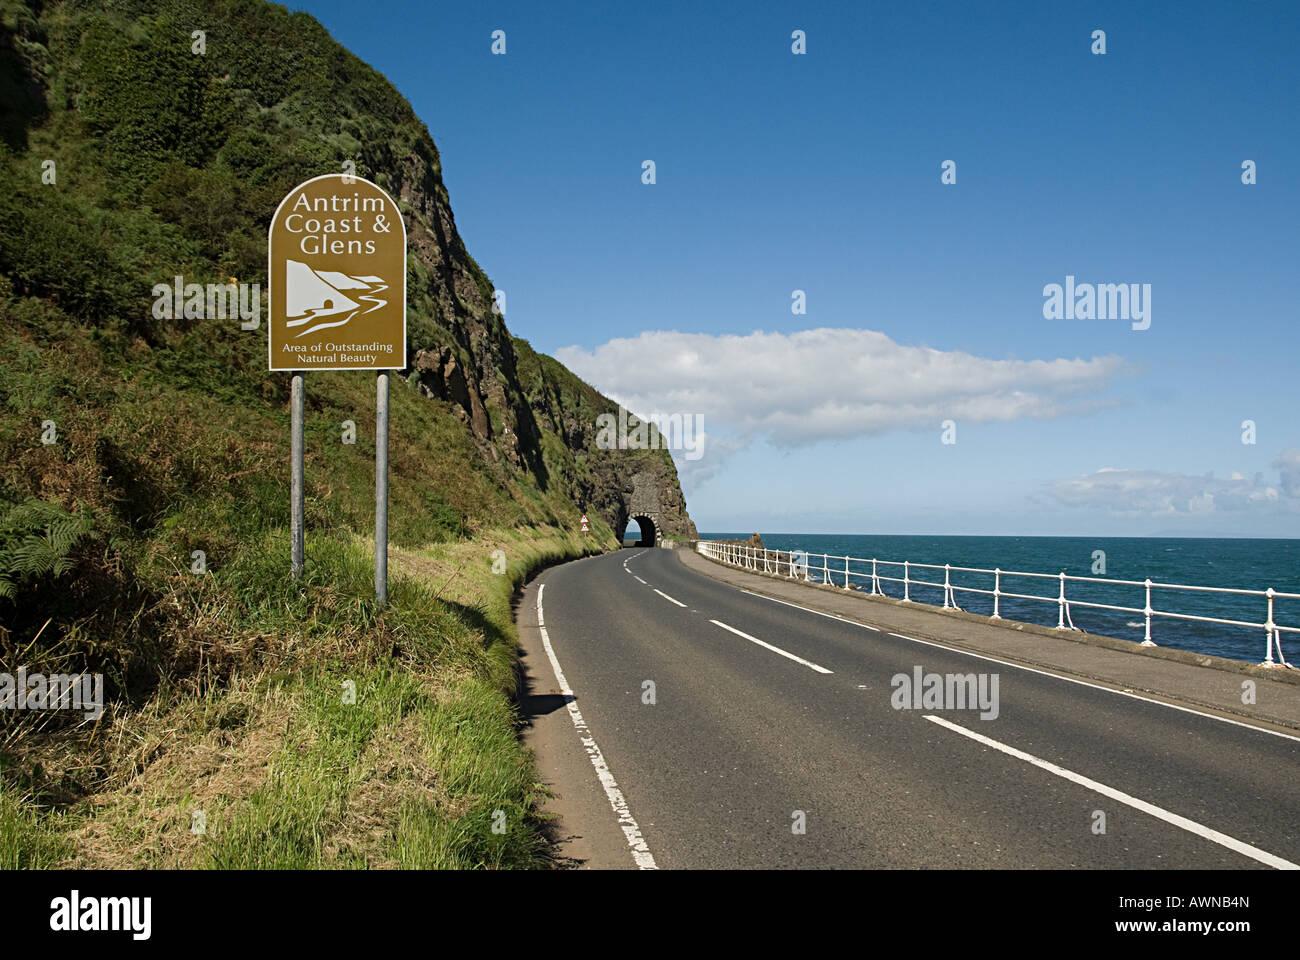 Antrim coast - Stock Image